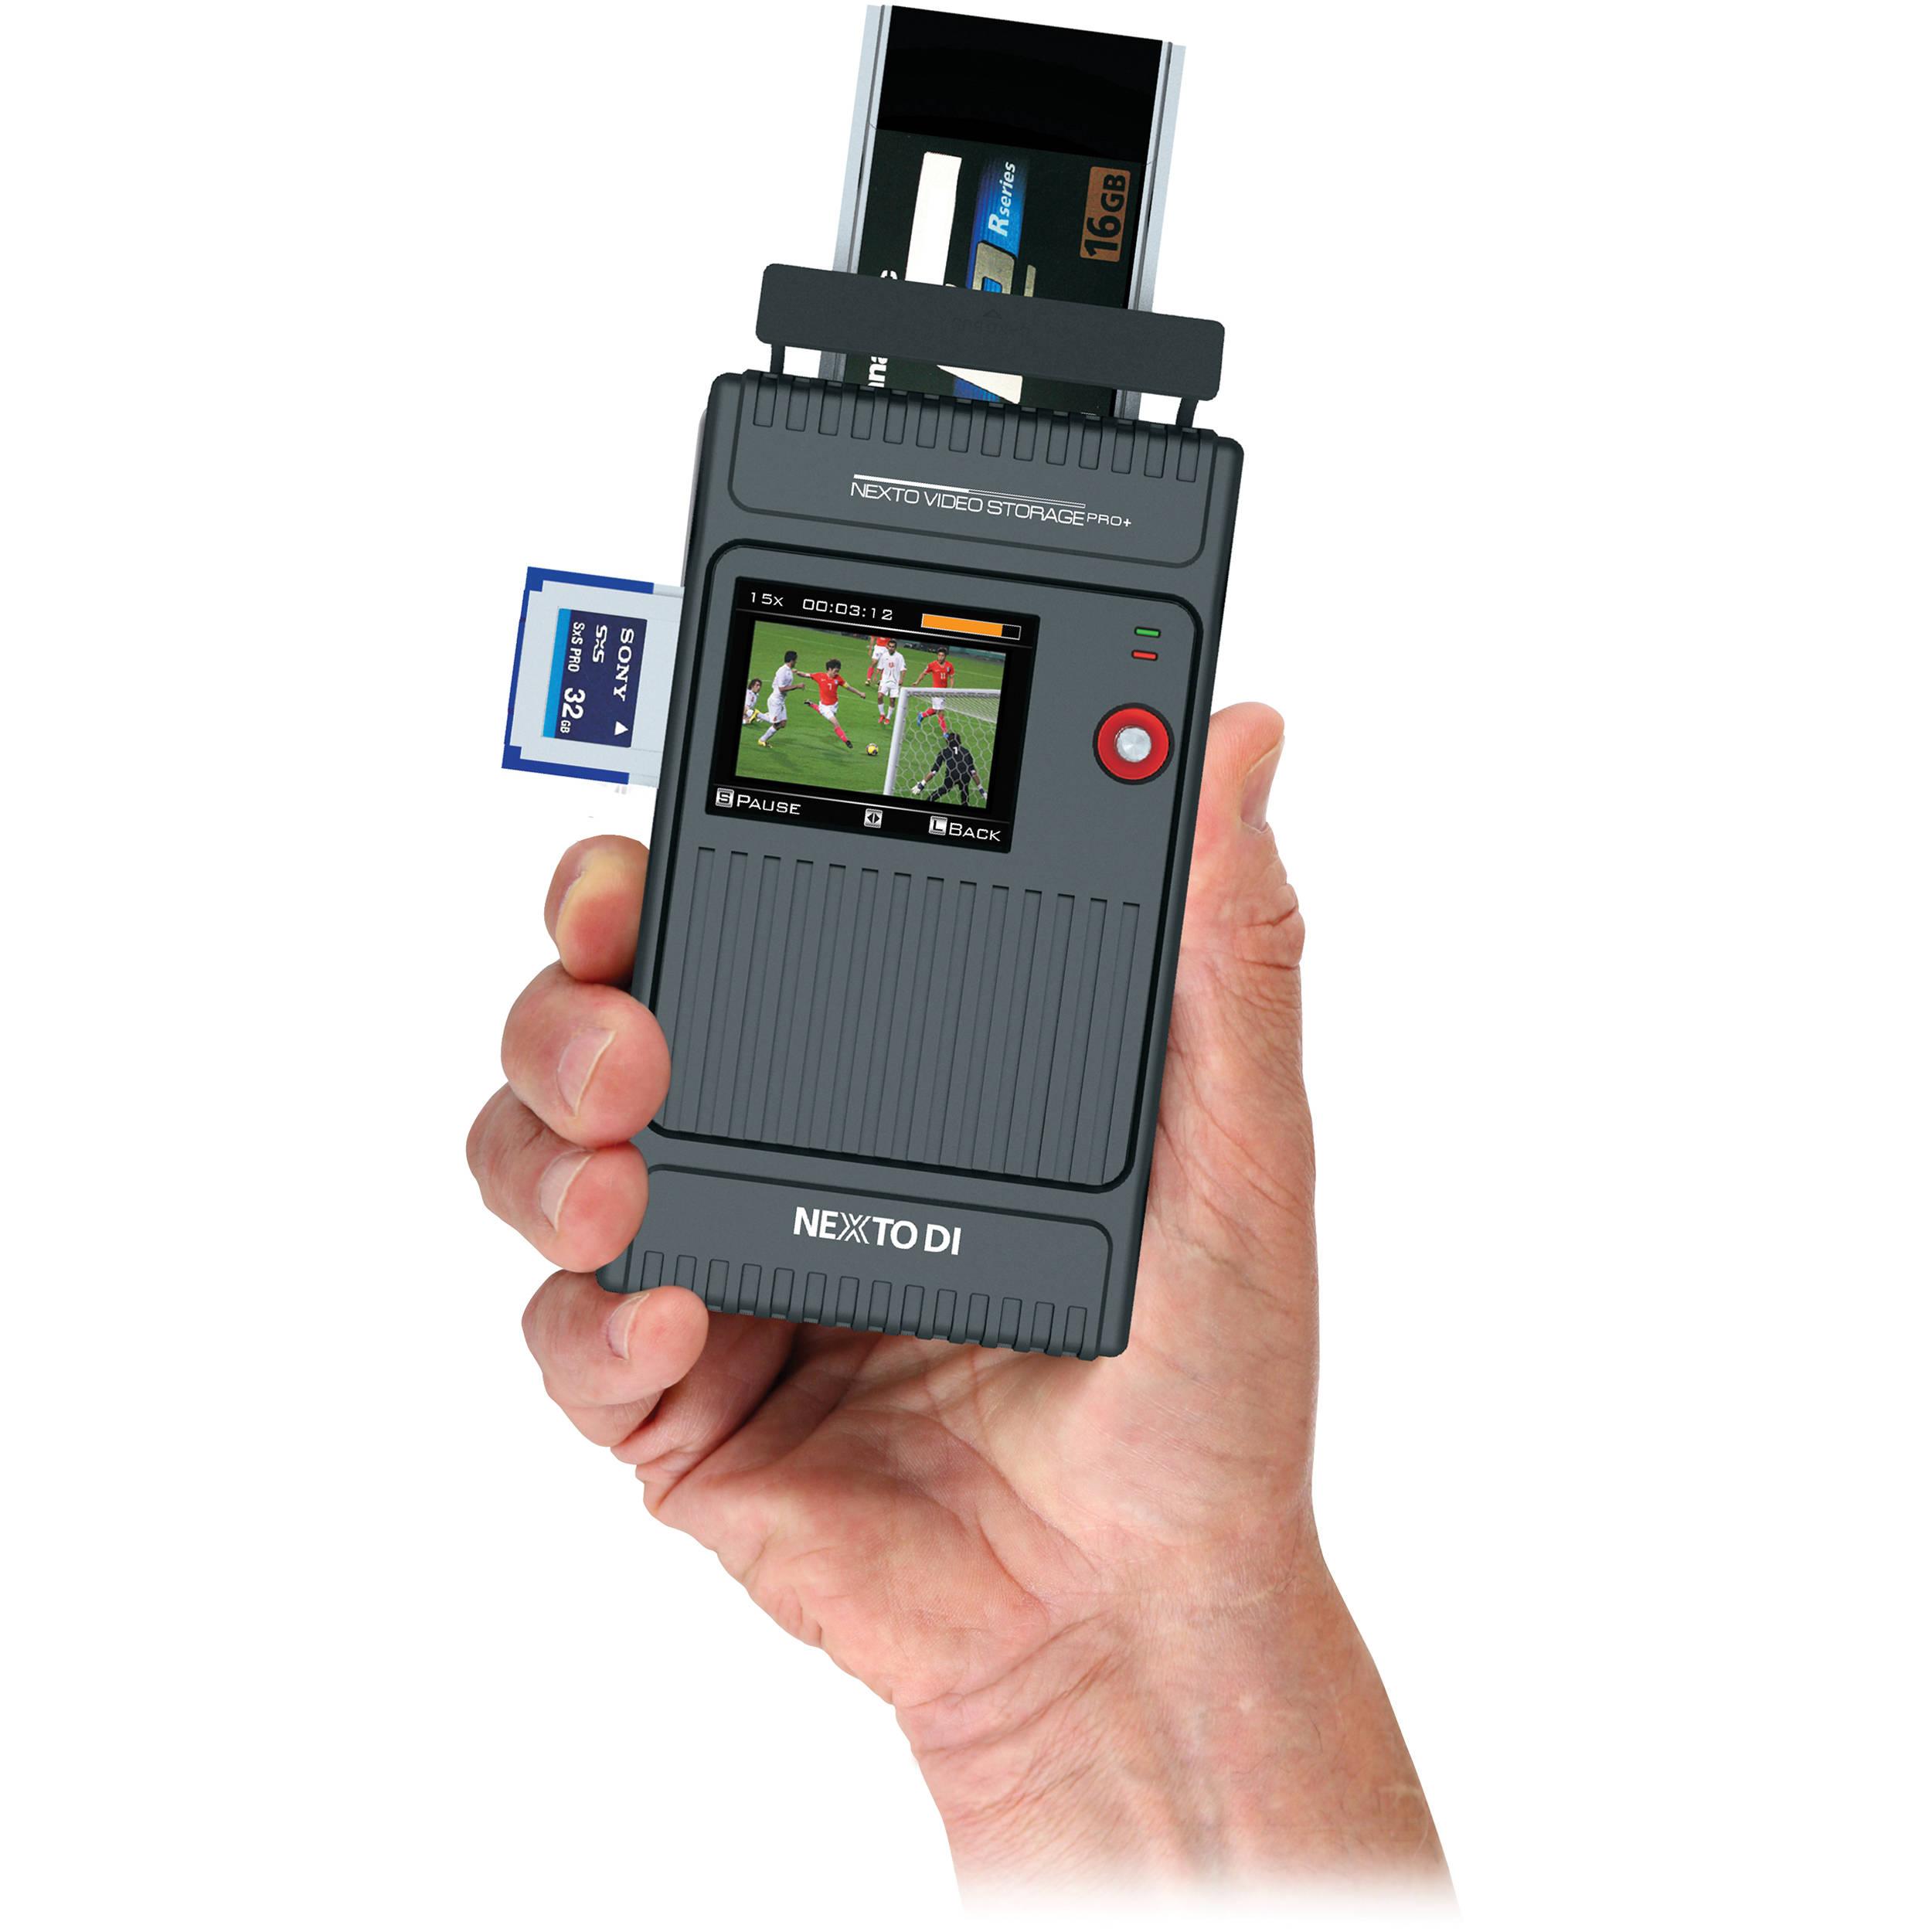 Nexto Di 750 Gb Nvs2525 P Video Storage Pro With Plus 1 Pack For Panasonic